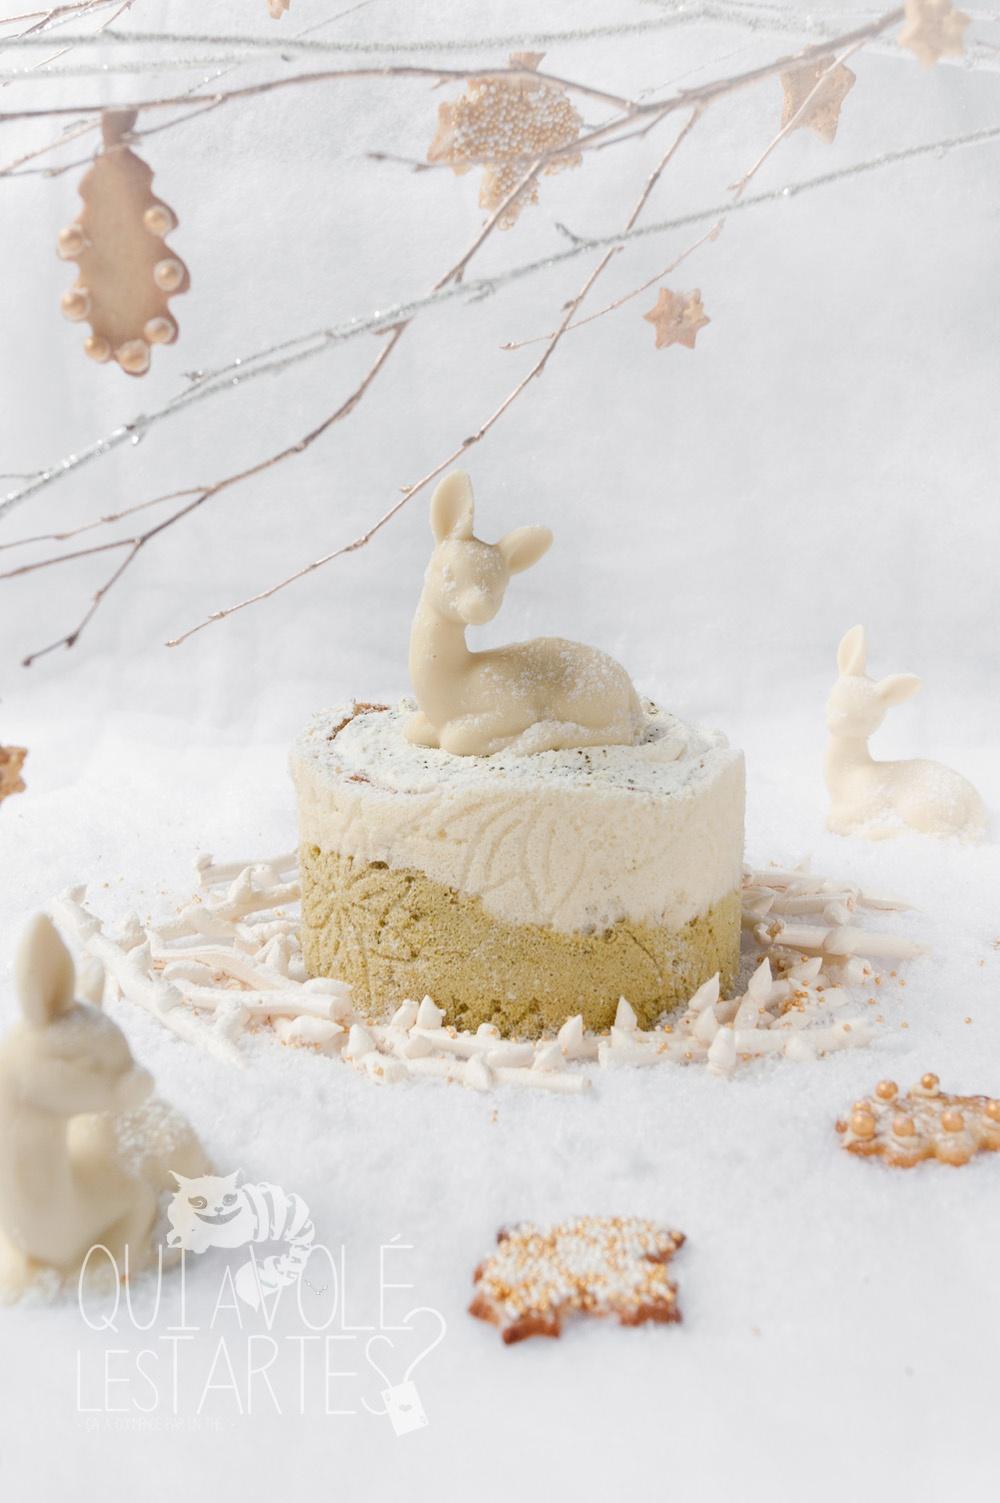 Nara - charlotte sans gluten MatchaYuzu - Studio 2 créaion - Qui a volé les tartes